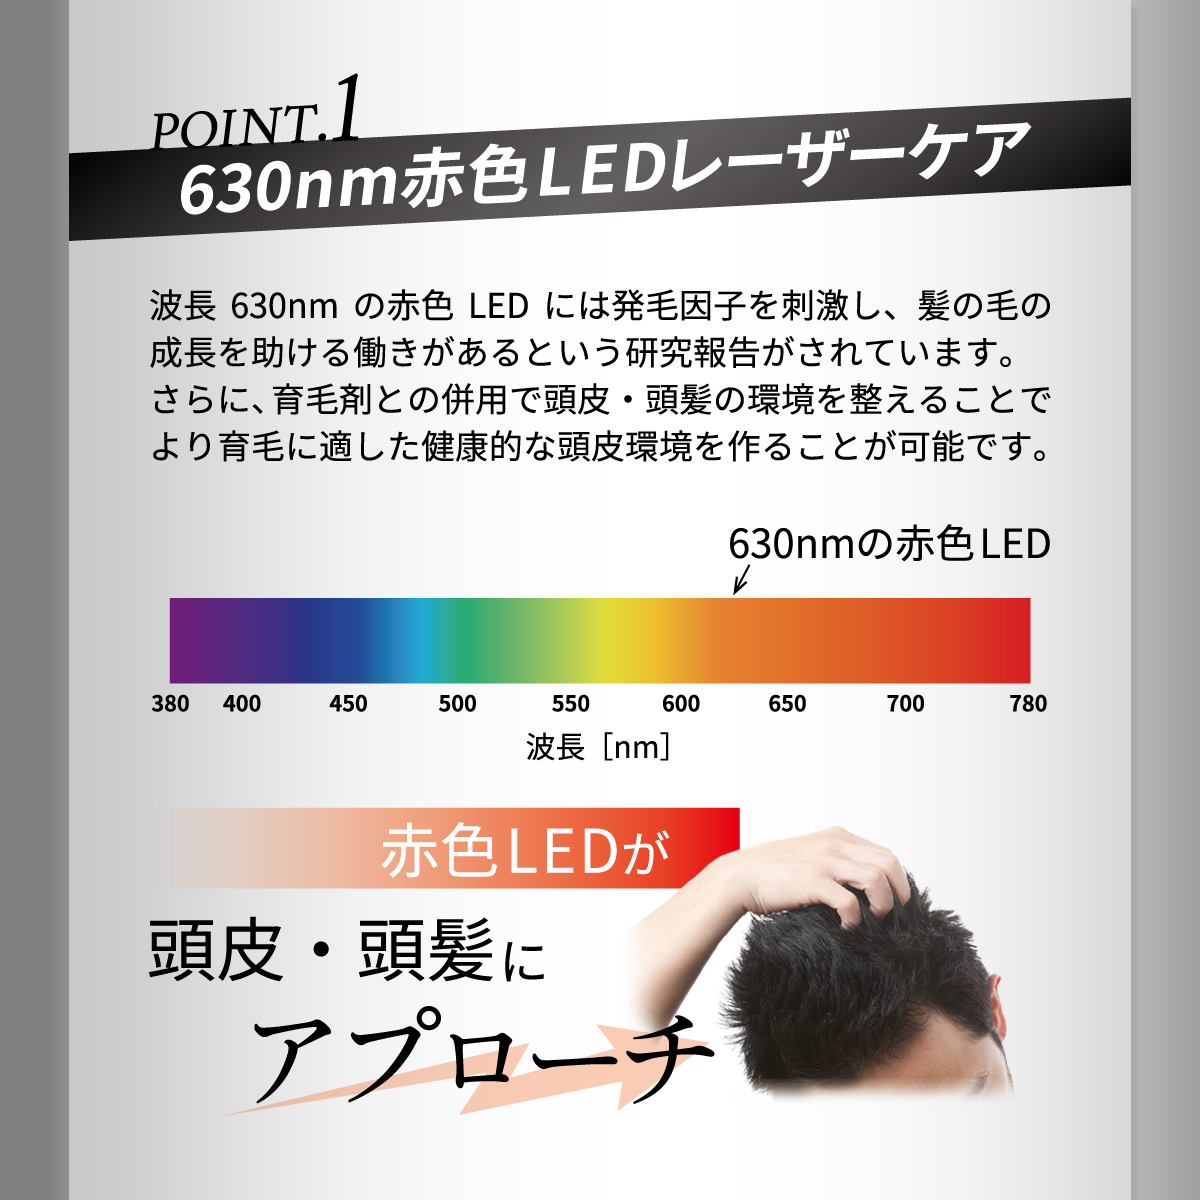 【LEDリライブ】 頭皮頭髪ケア